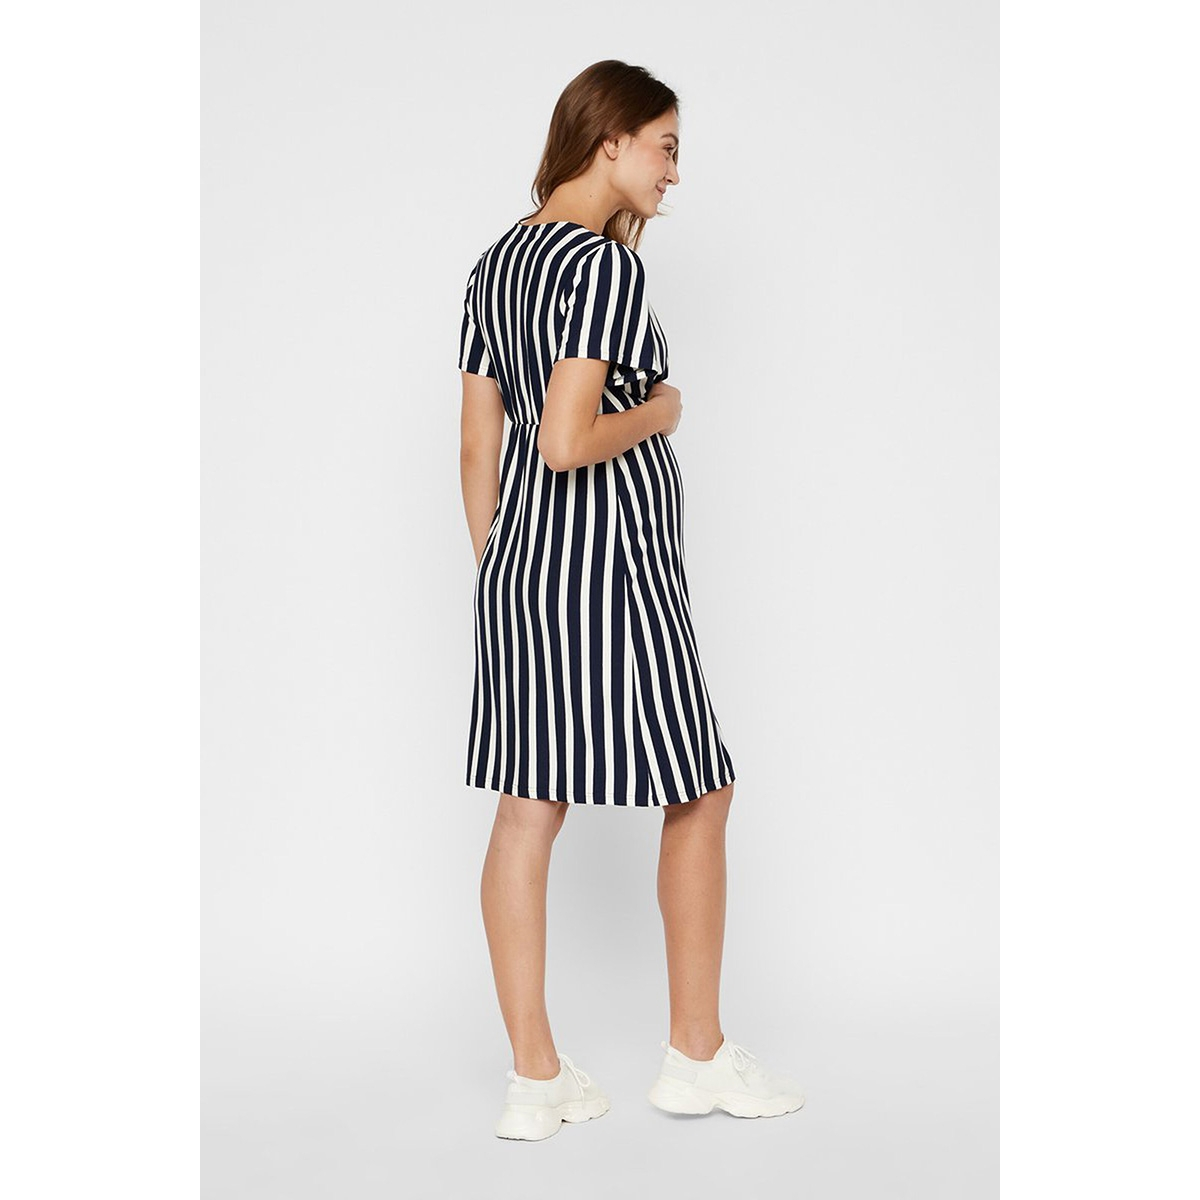 mlnewbecky tess s/s jersey abk dres 20011226 mama-licious jurk navy  blazer